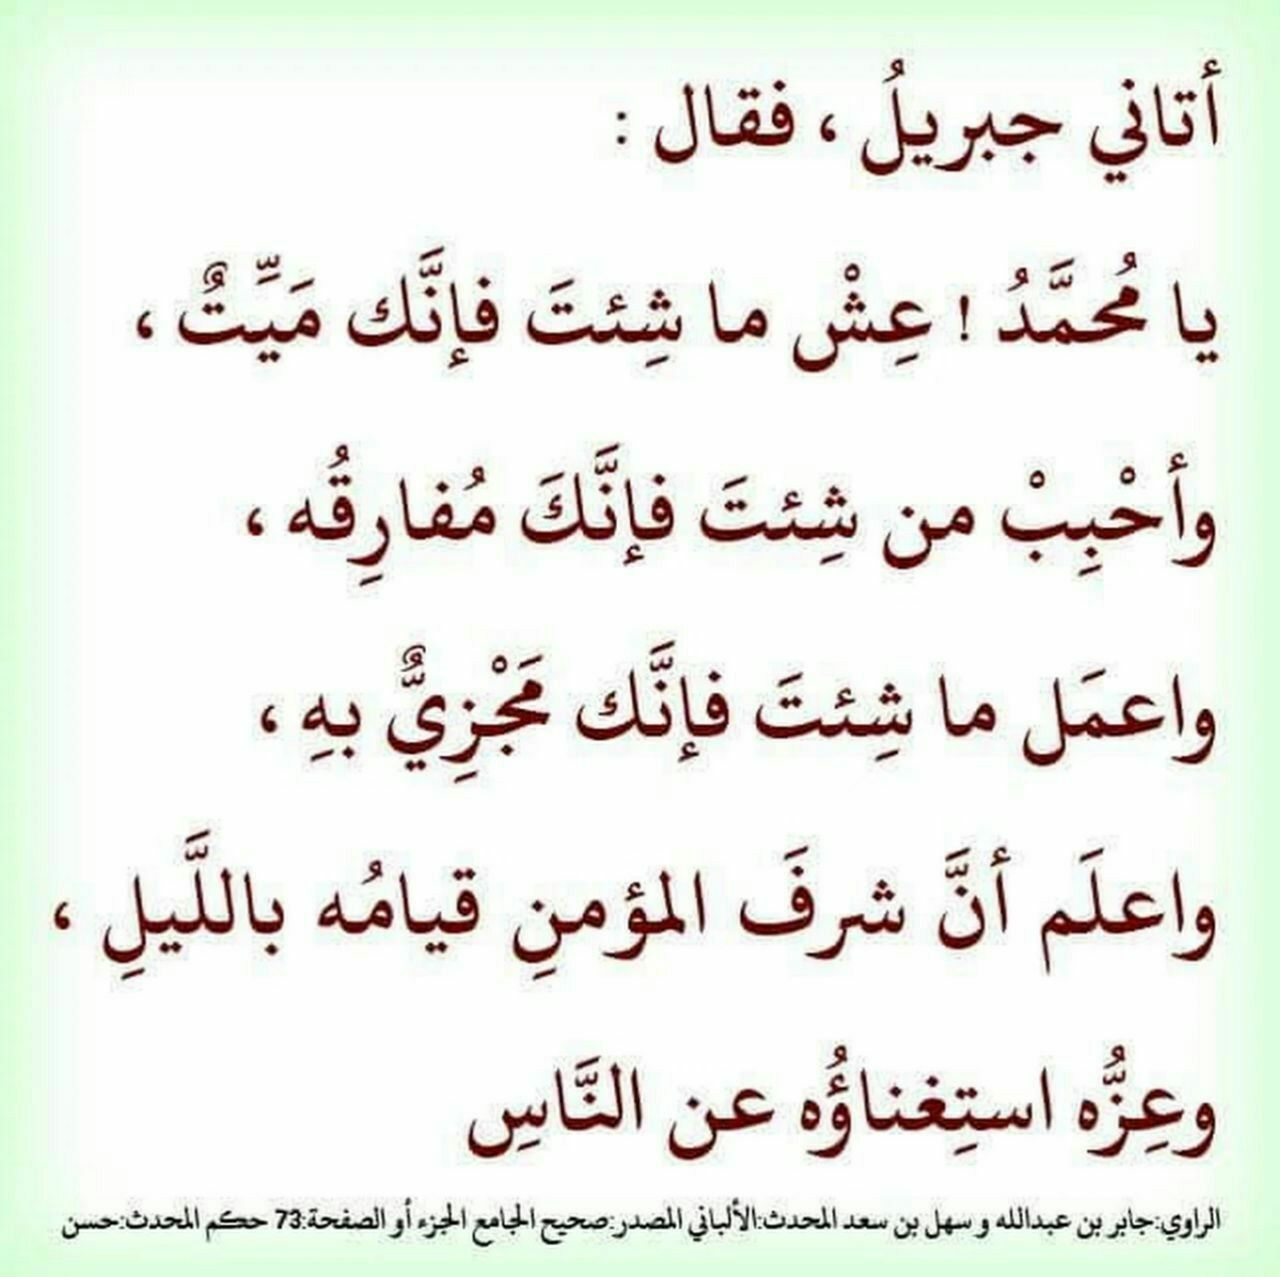 Pin By Noureddin Nour On أجيب دعوة الداعي Islamic Phrases Words Of Wisdom Words